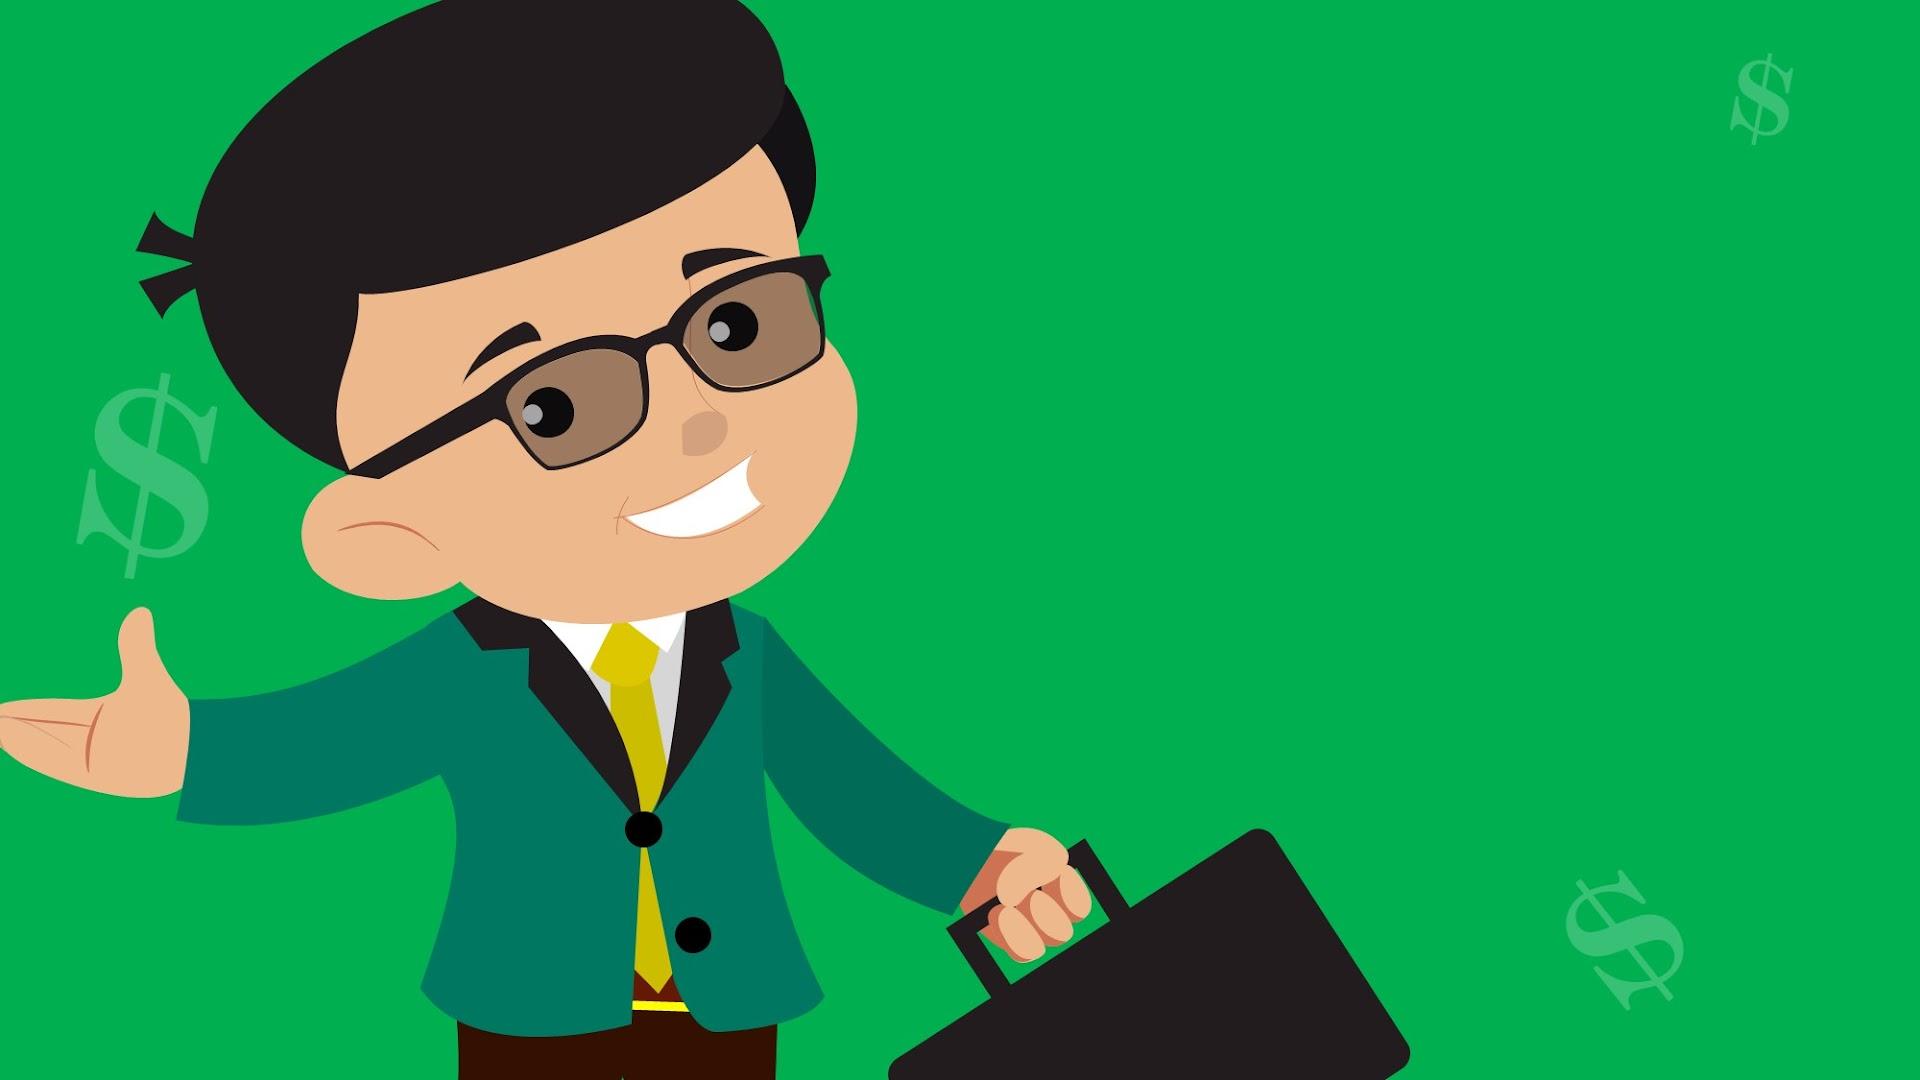 Cartoon Boy as Businessman  - free background for Presentations